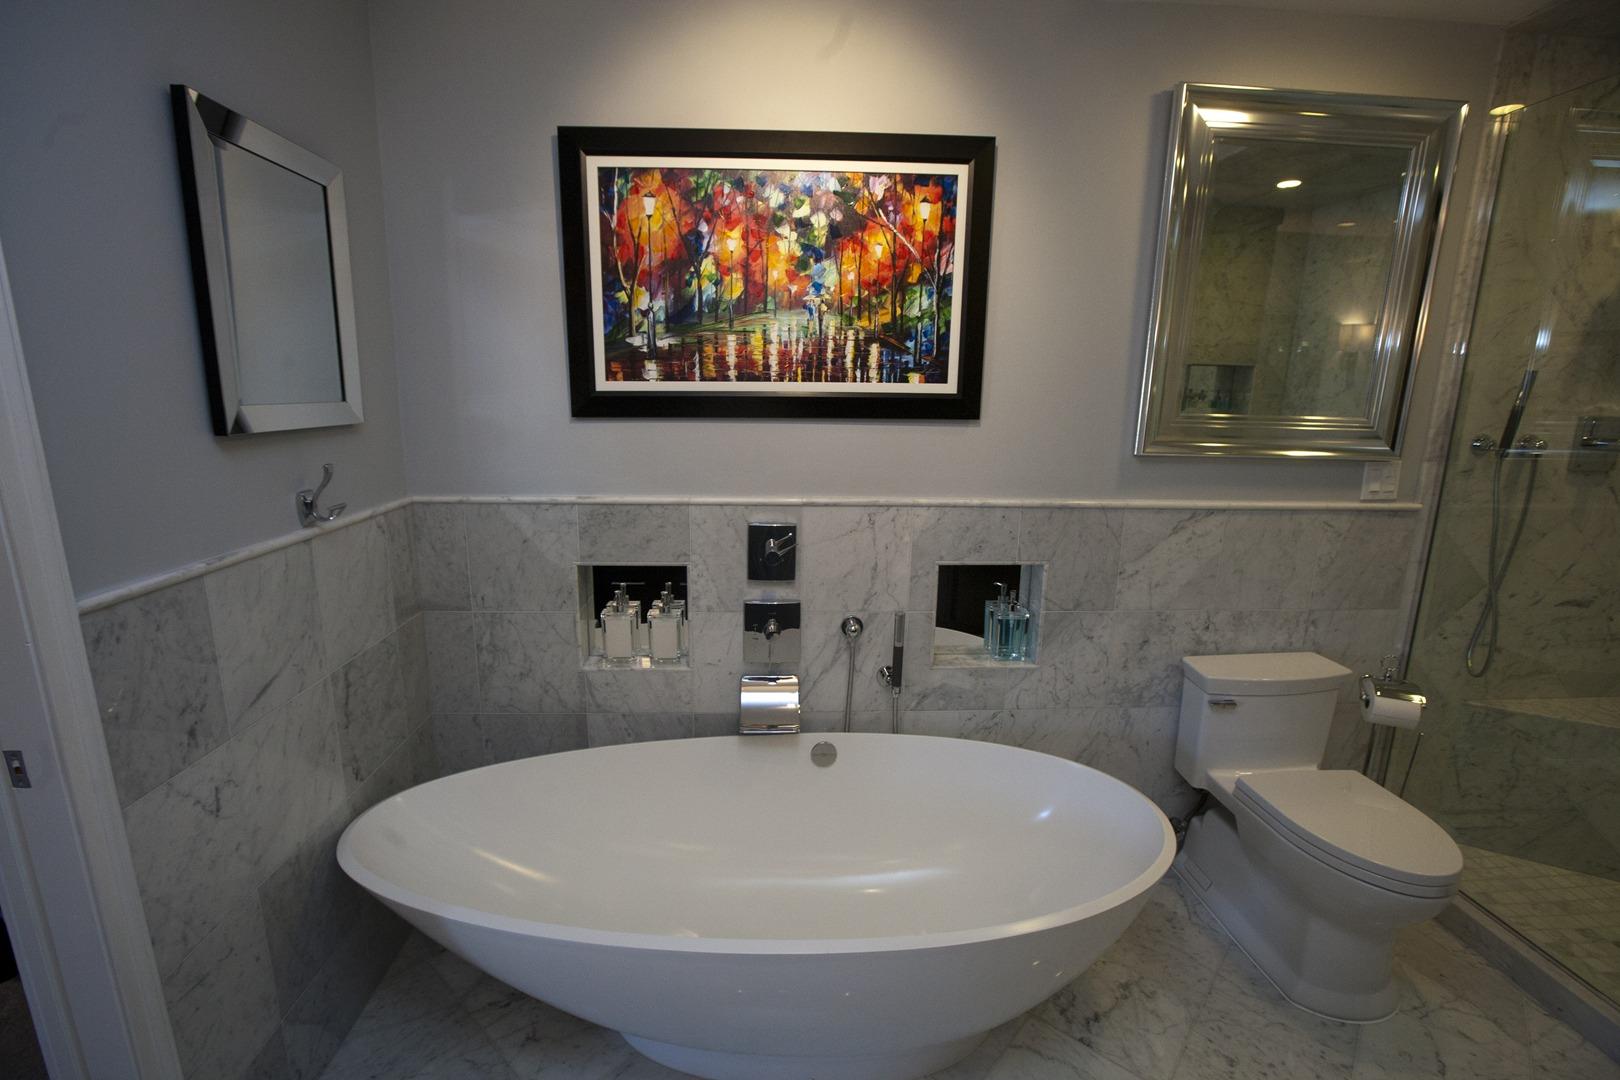 photo gallery page 1 kitchen remodel okc Bath remodeling kitchen remodeling Gibraltar Construction Co Oklahoma City Oklahoma